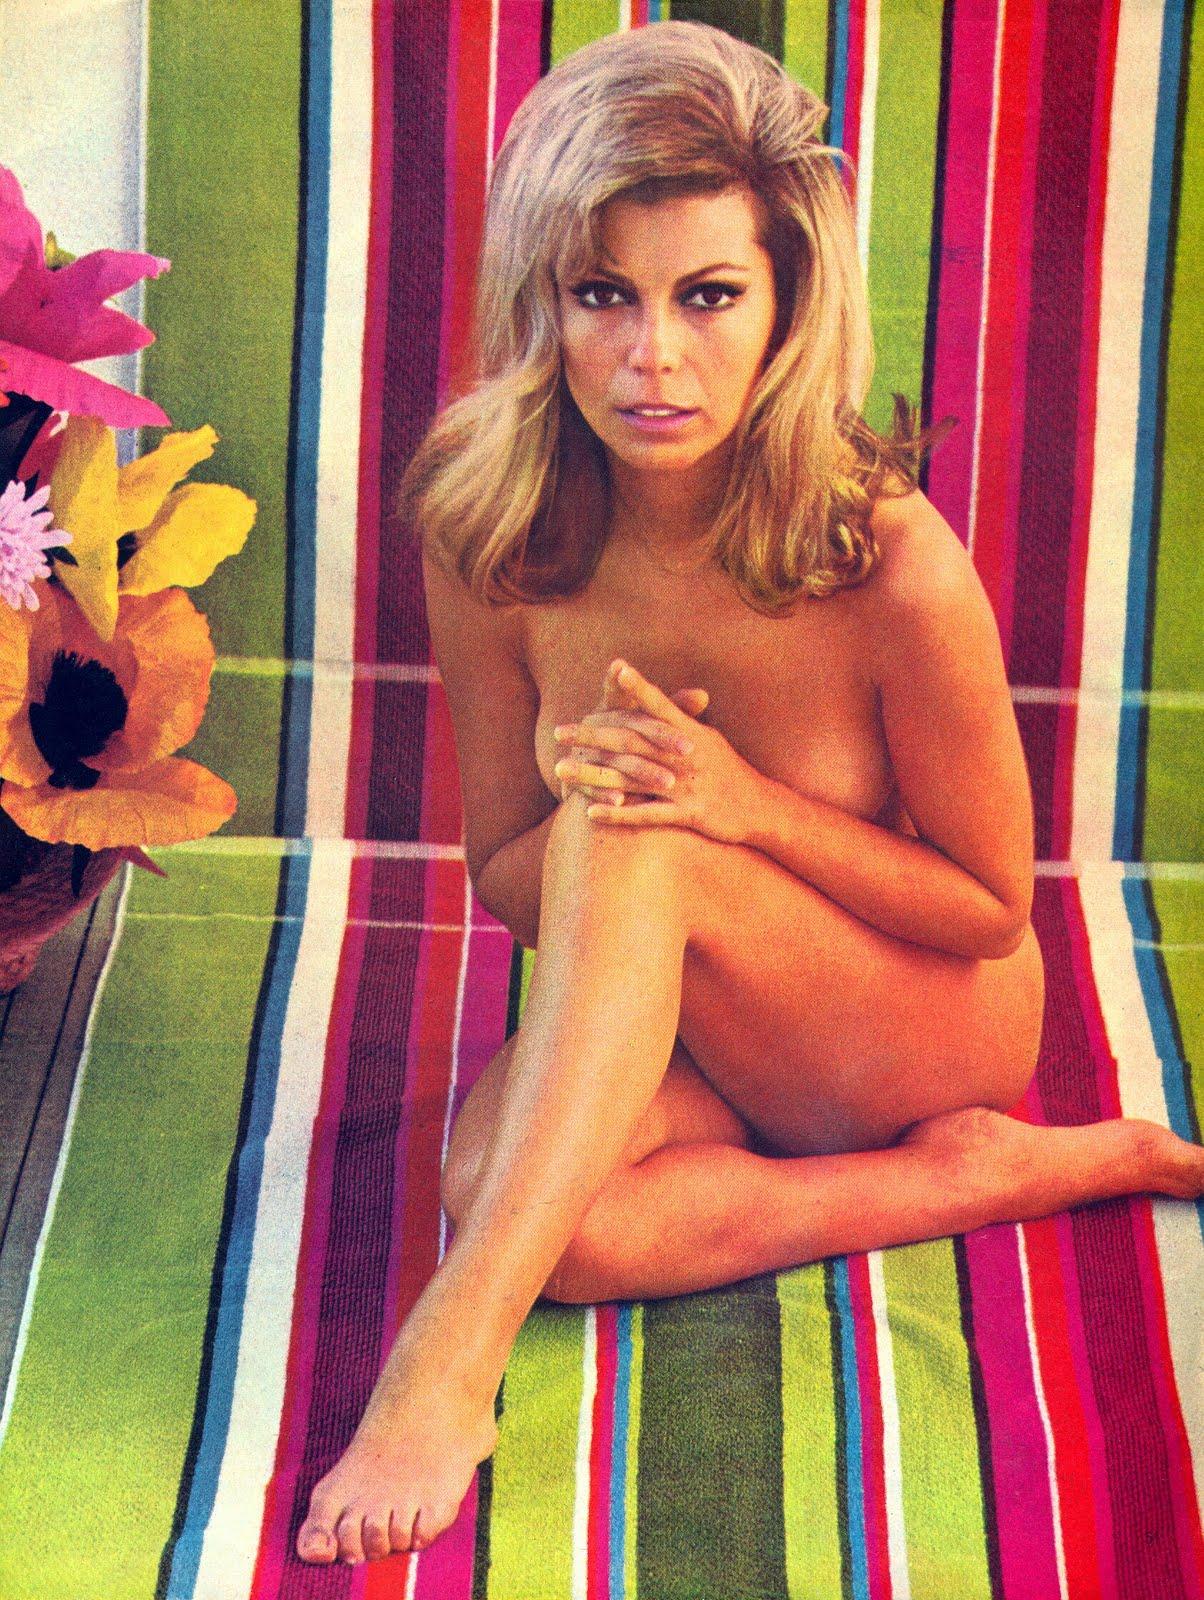 Nancy sinatra nude playboy pictures, kiki klement free video orgasm